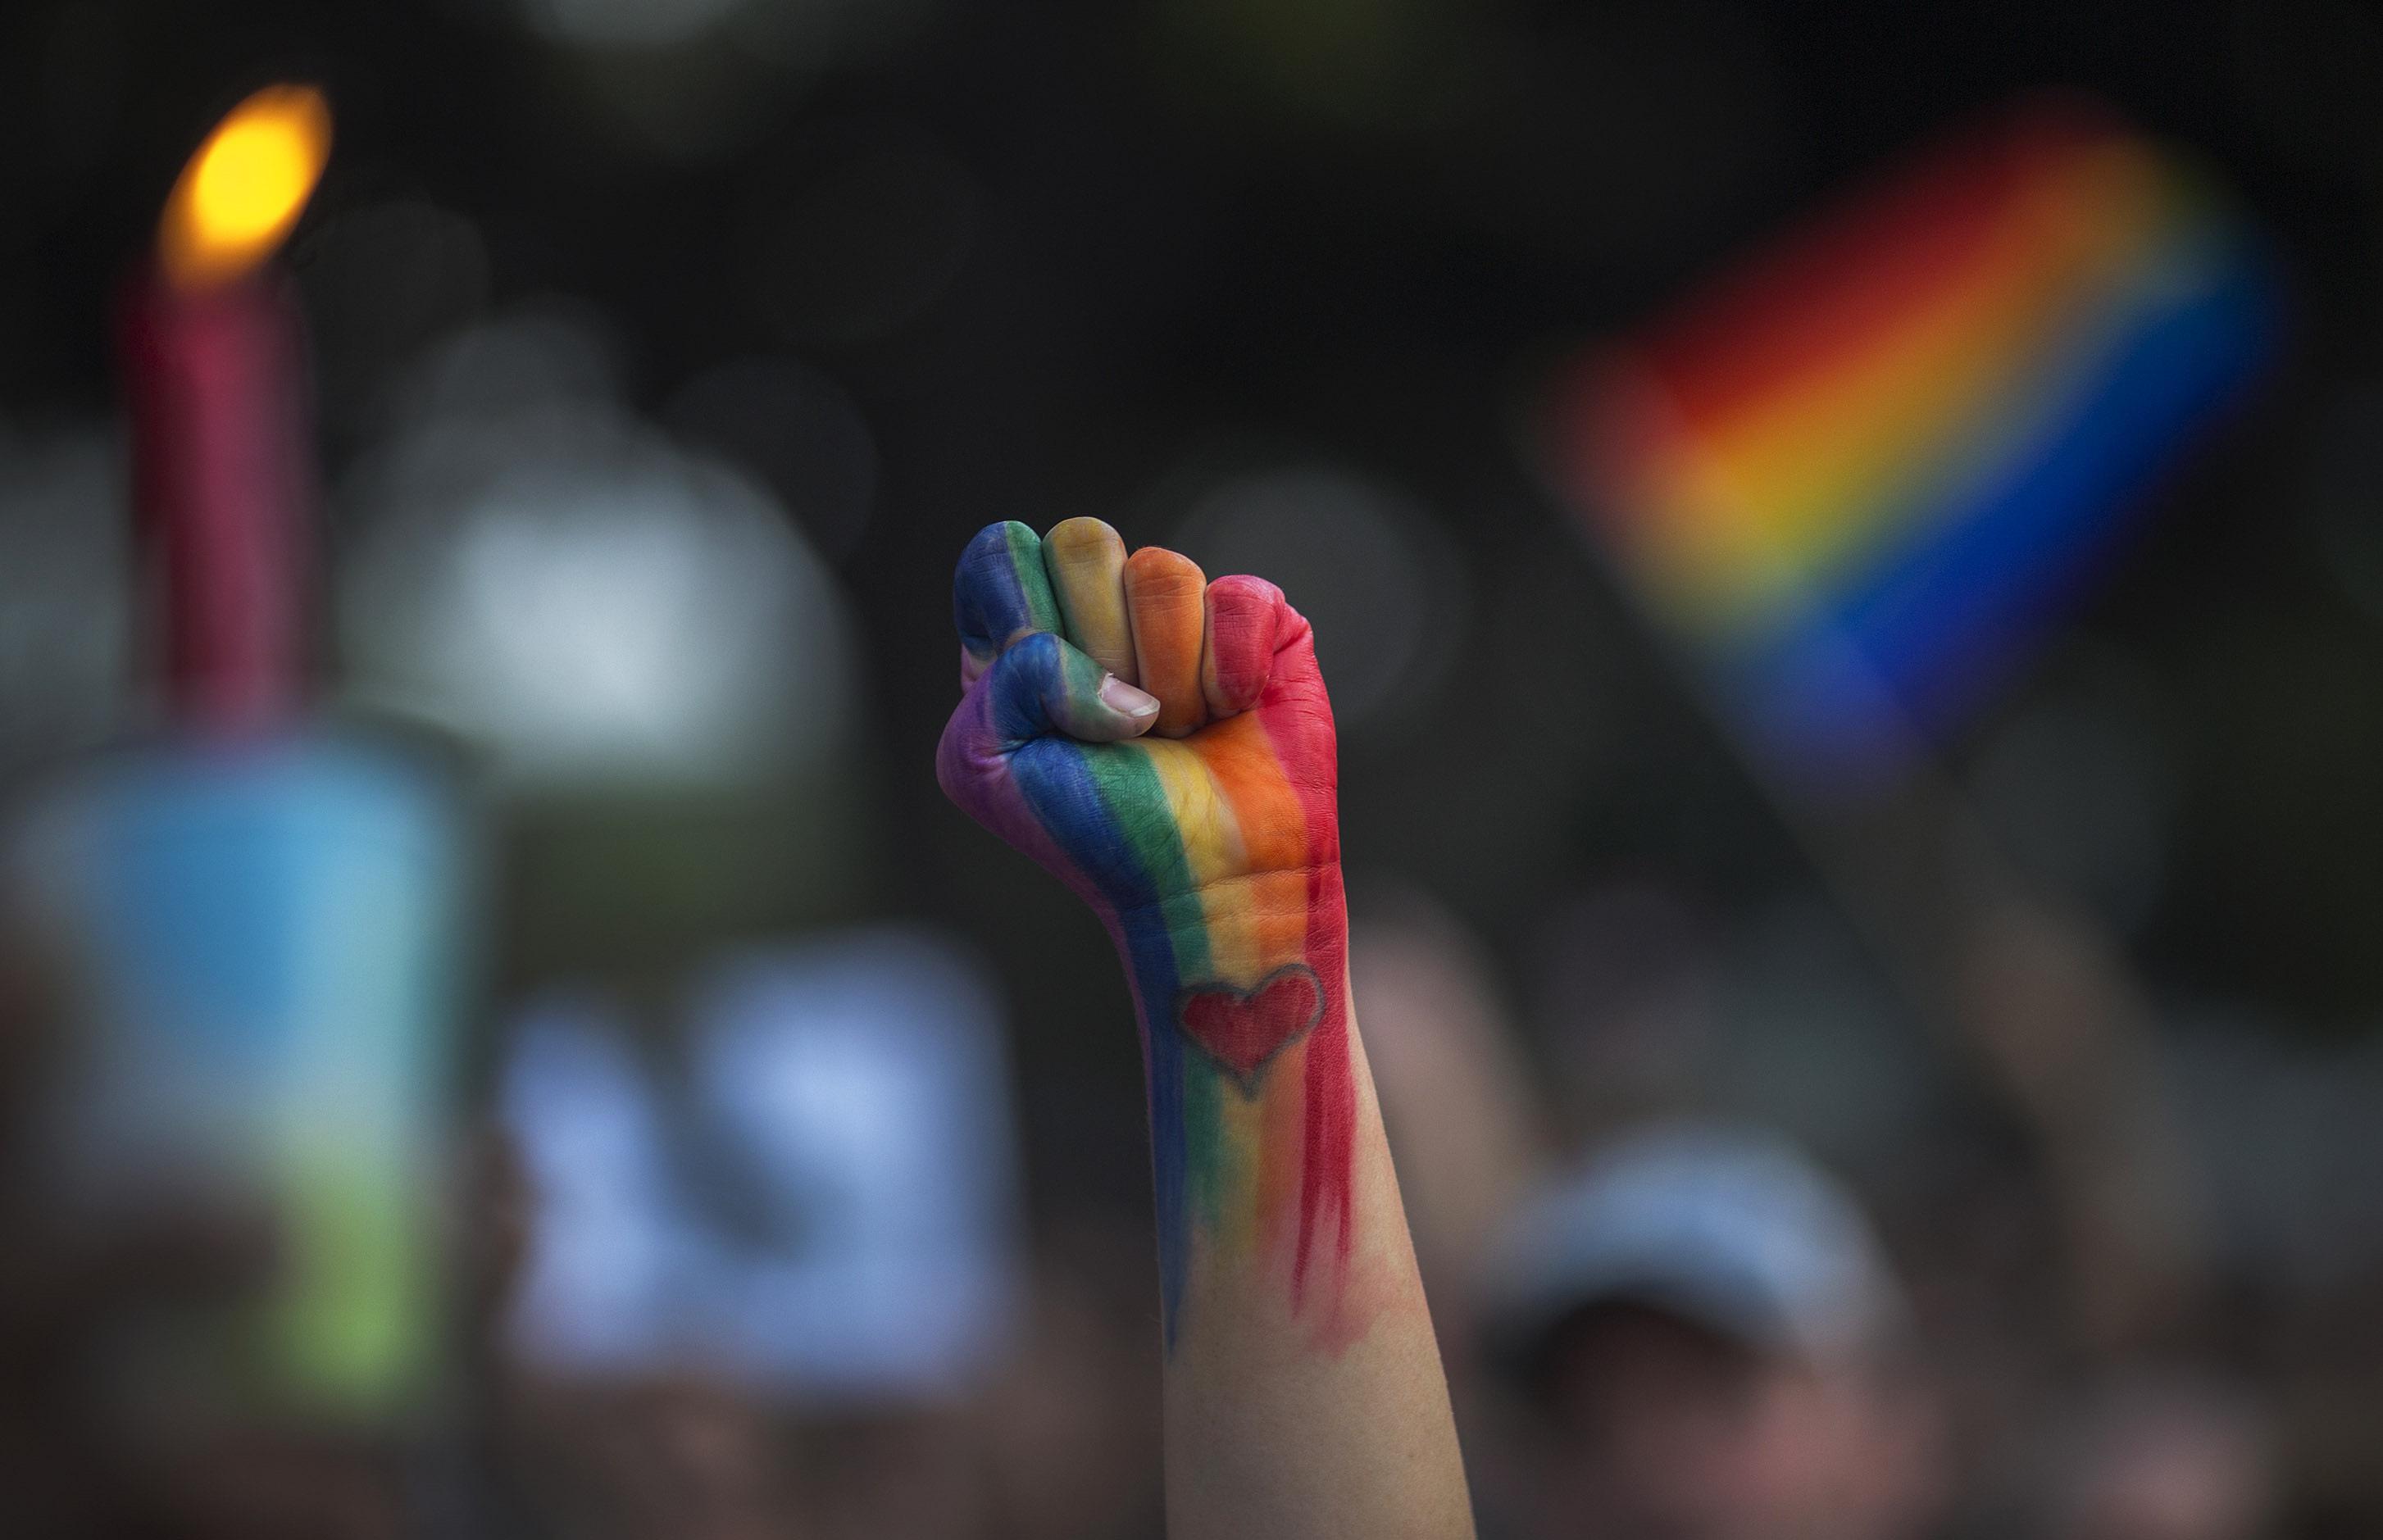 El origen de la marcha por el orgullo LGBT